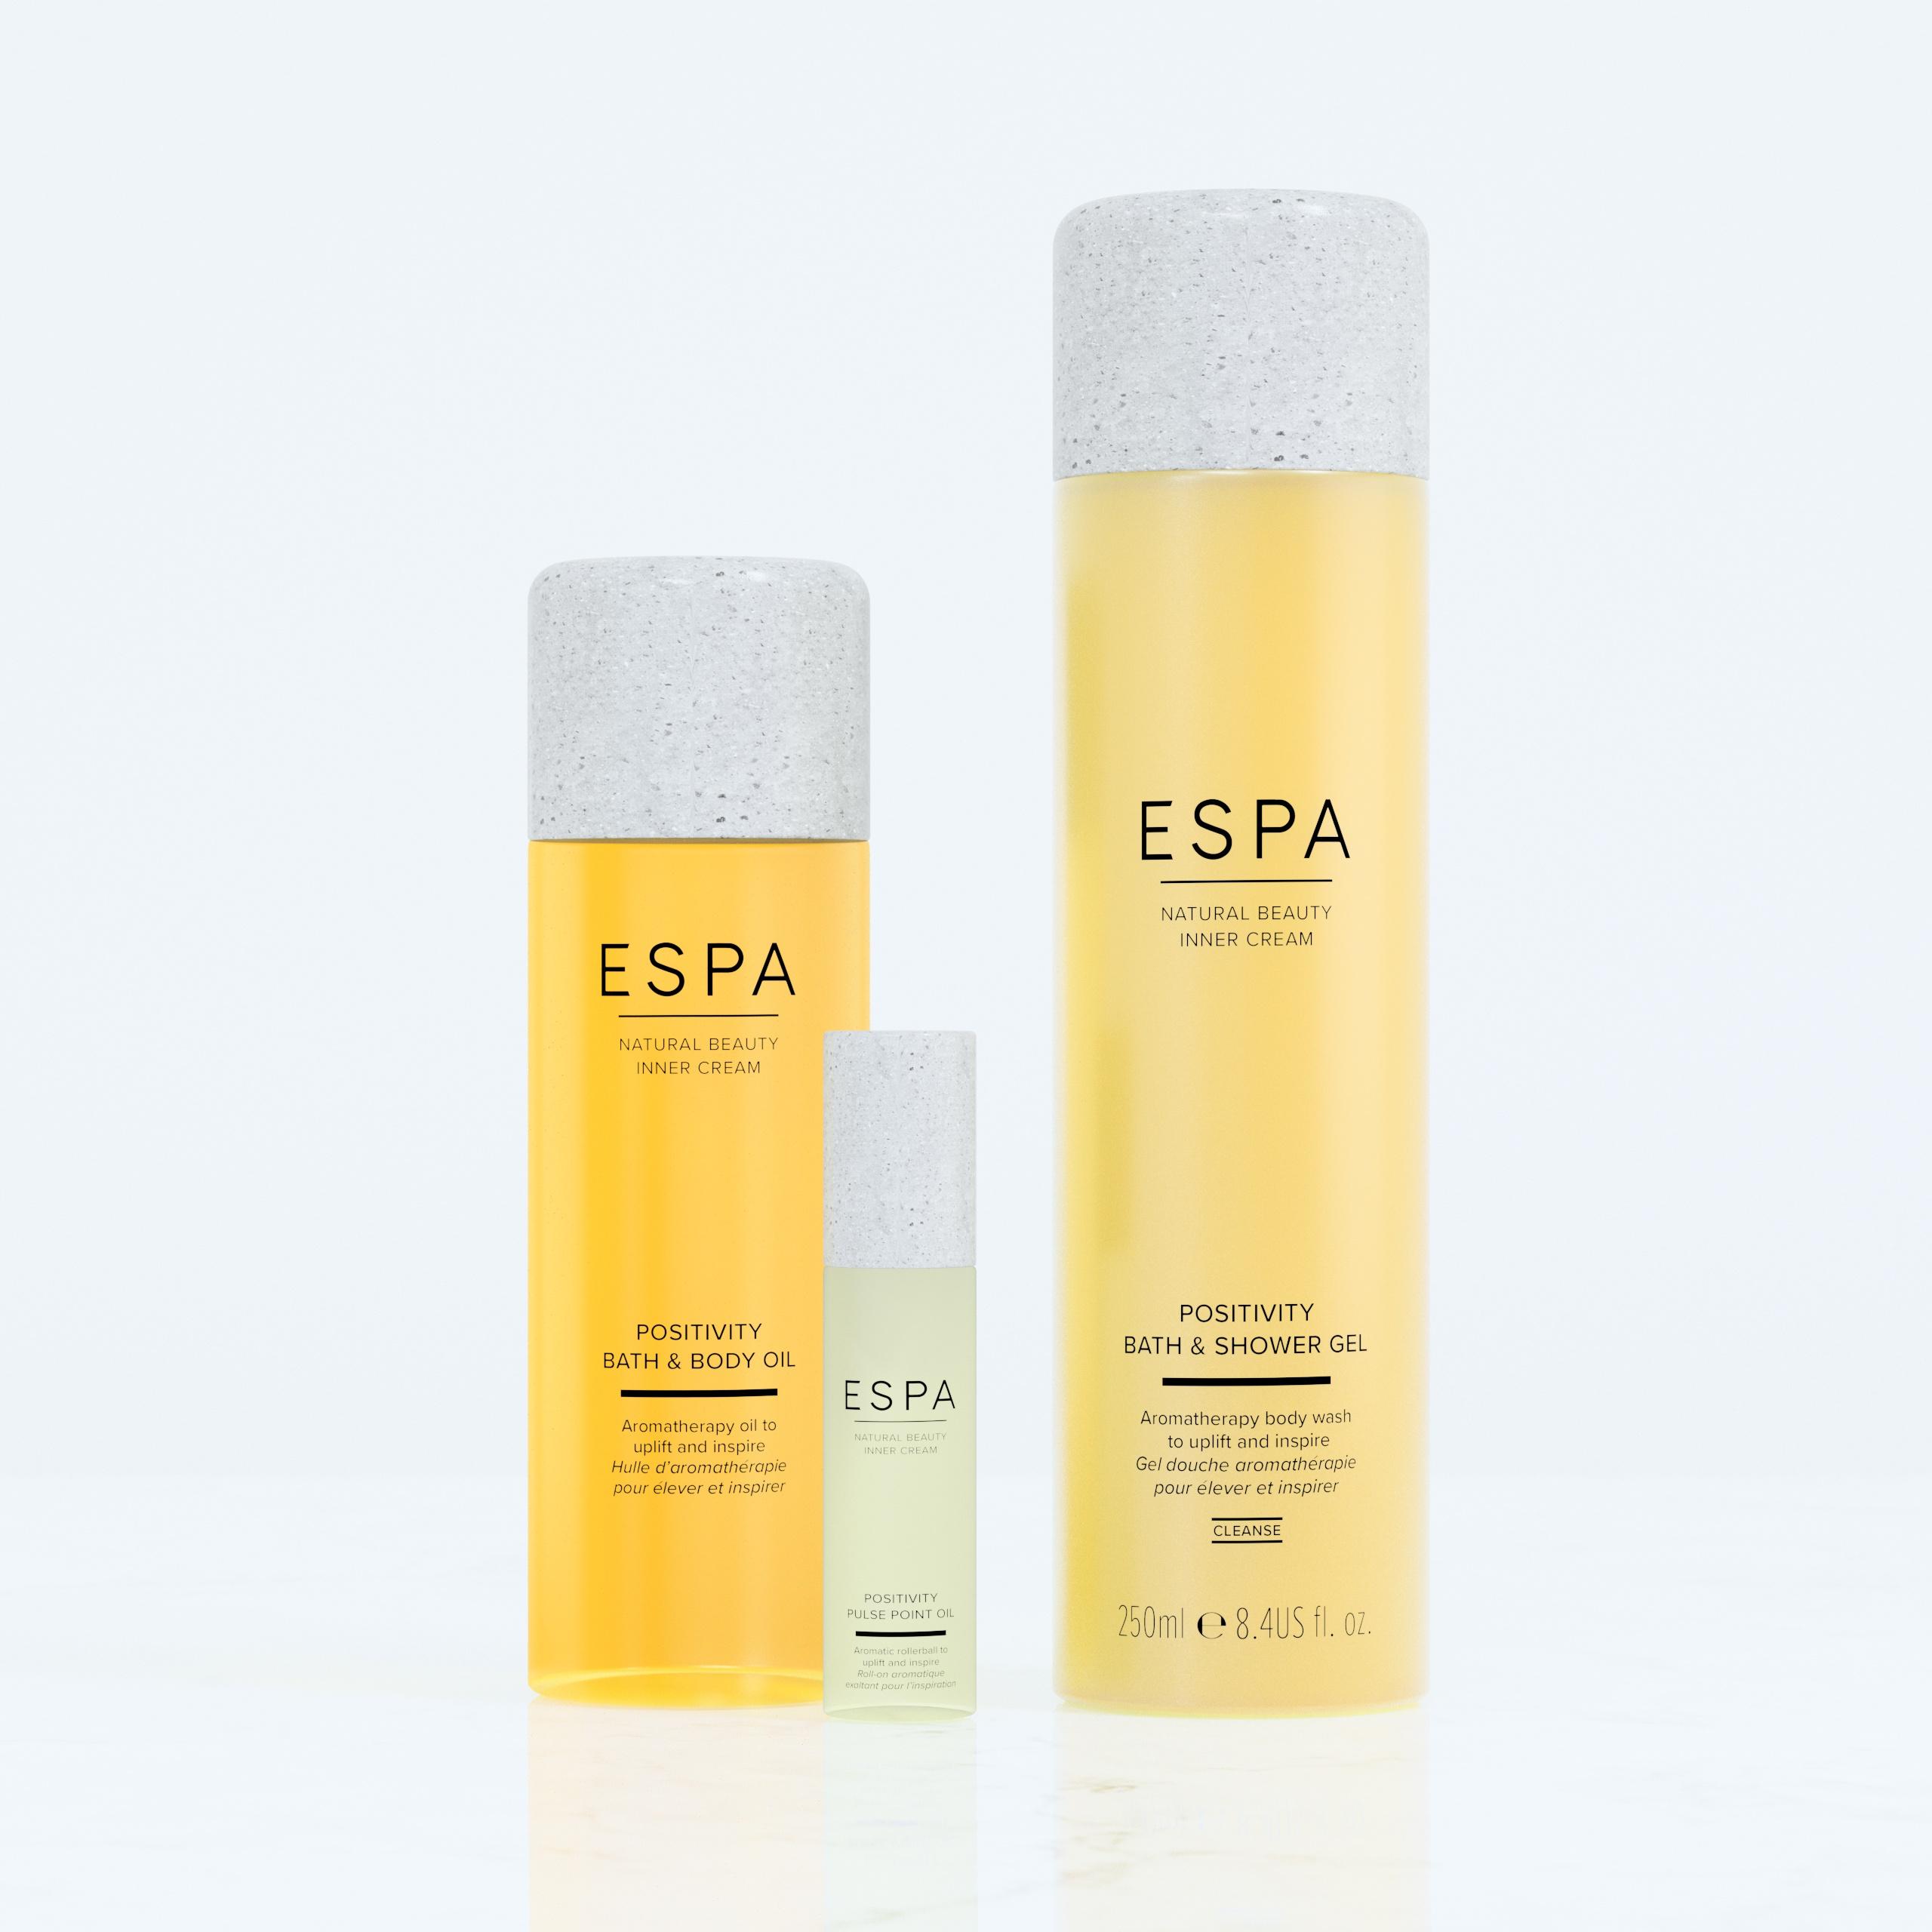 ESPA Product Range_2021-01-20_Studio_1